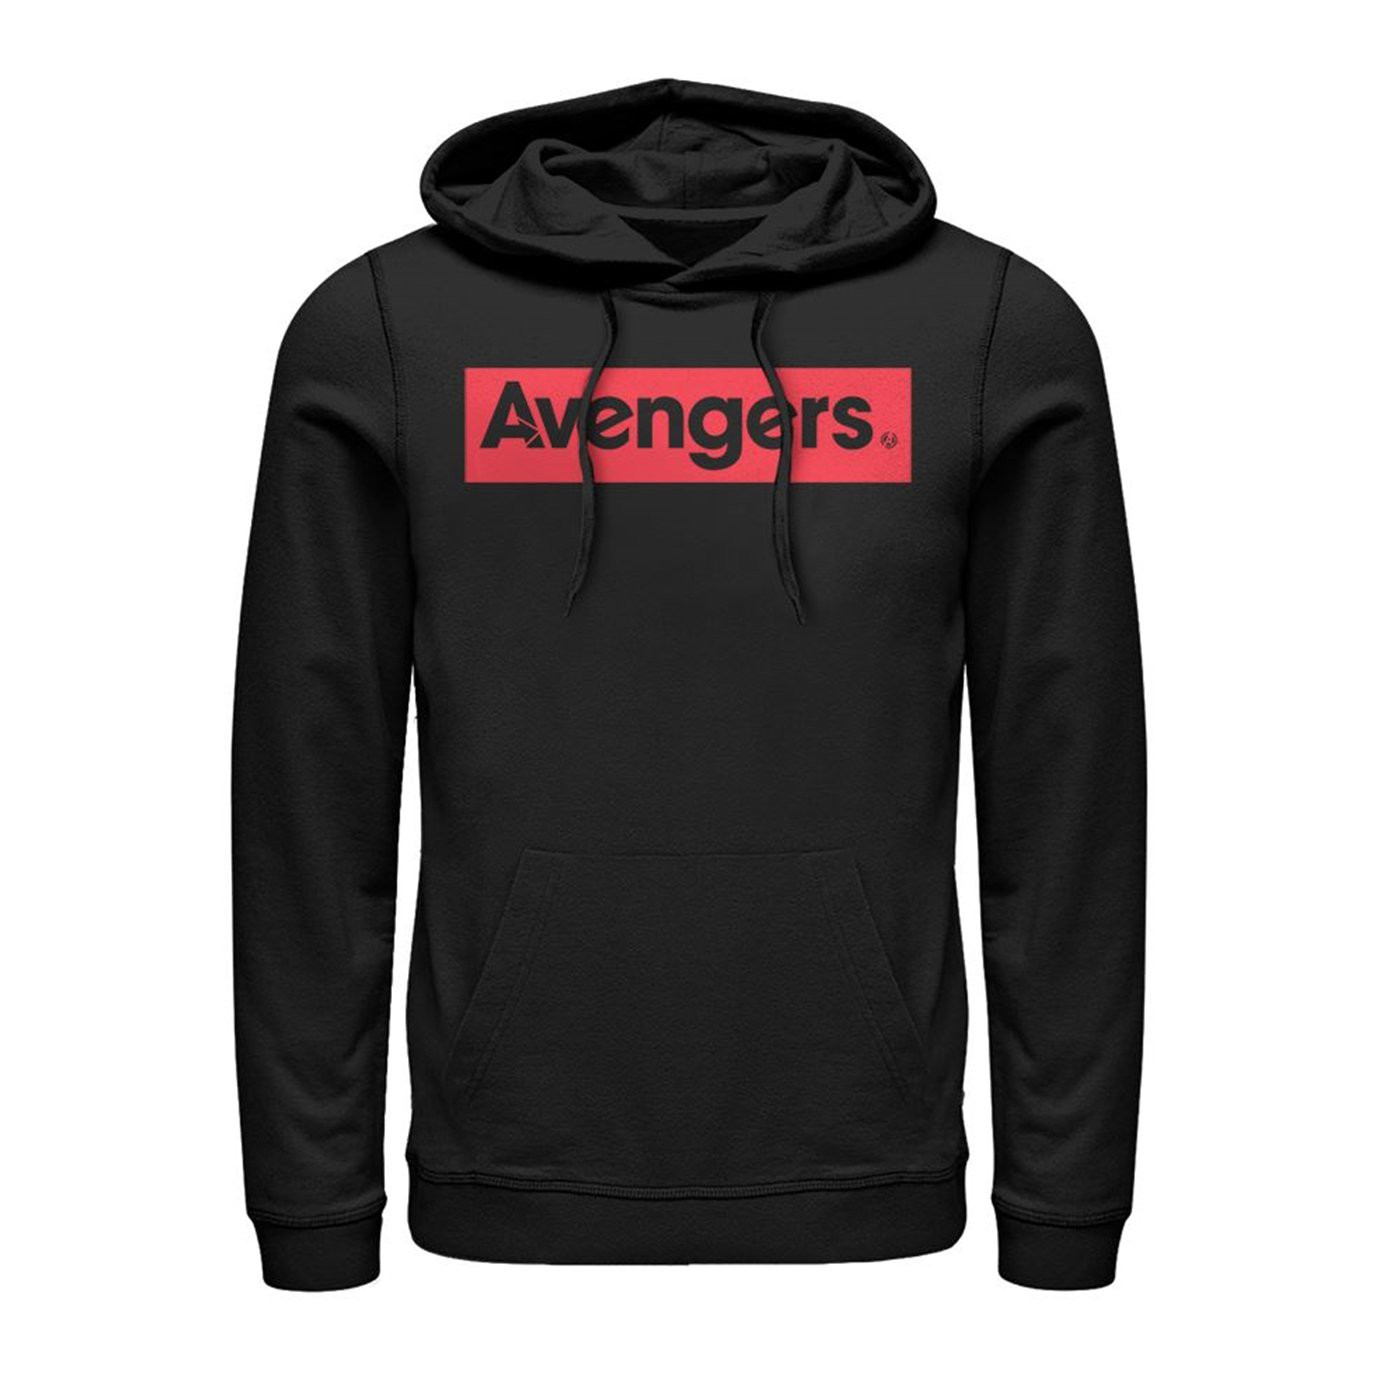 Avengers Endgame Text Hoodie